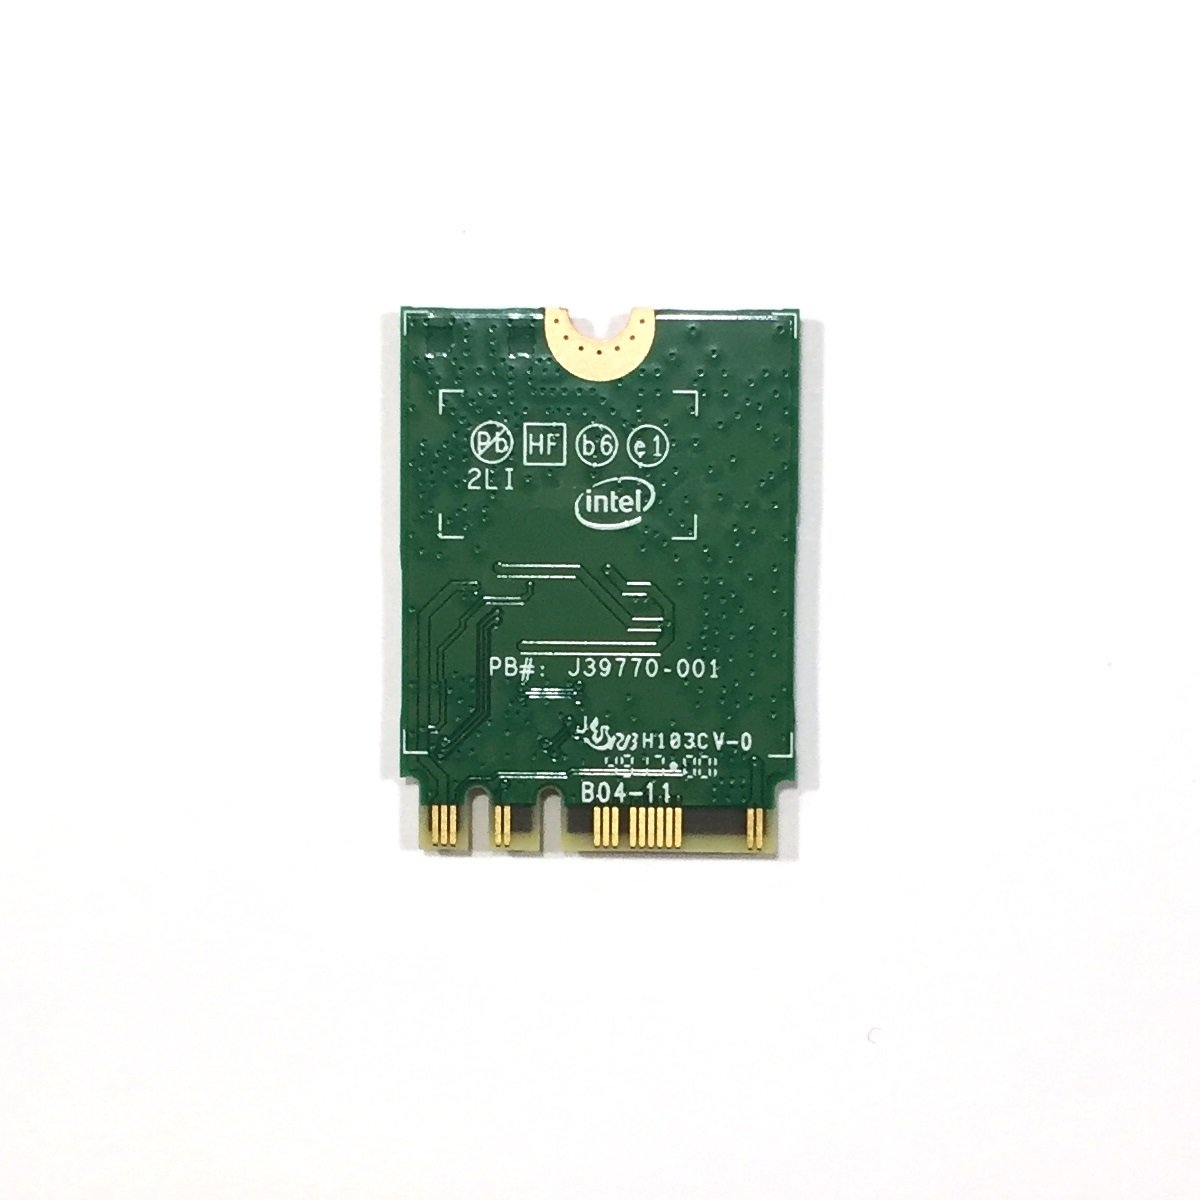 Intel Wireless-Ac 9260, 2230, 2X2 Ac+Bt, Gigabit, No Vpro by Intel